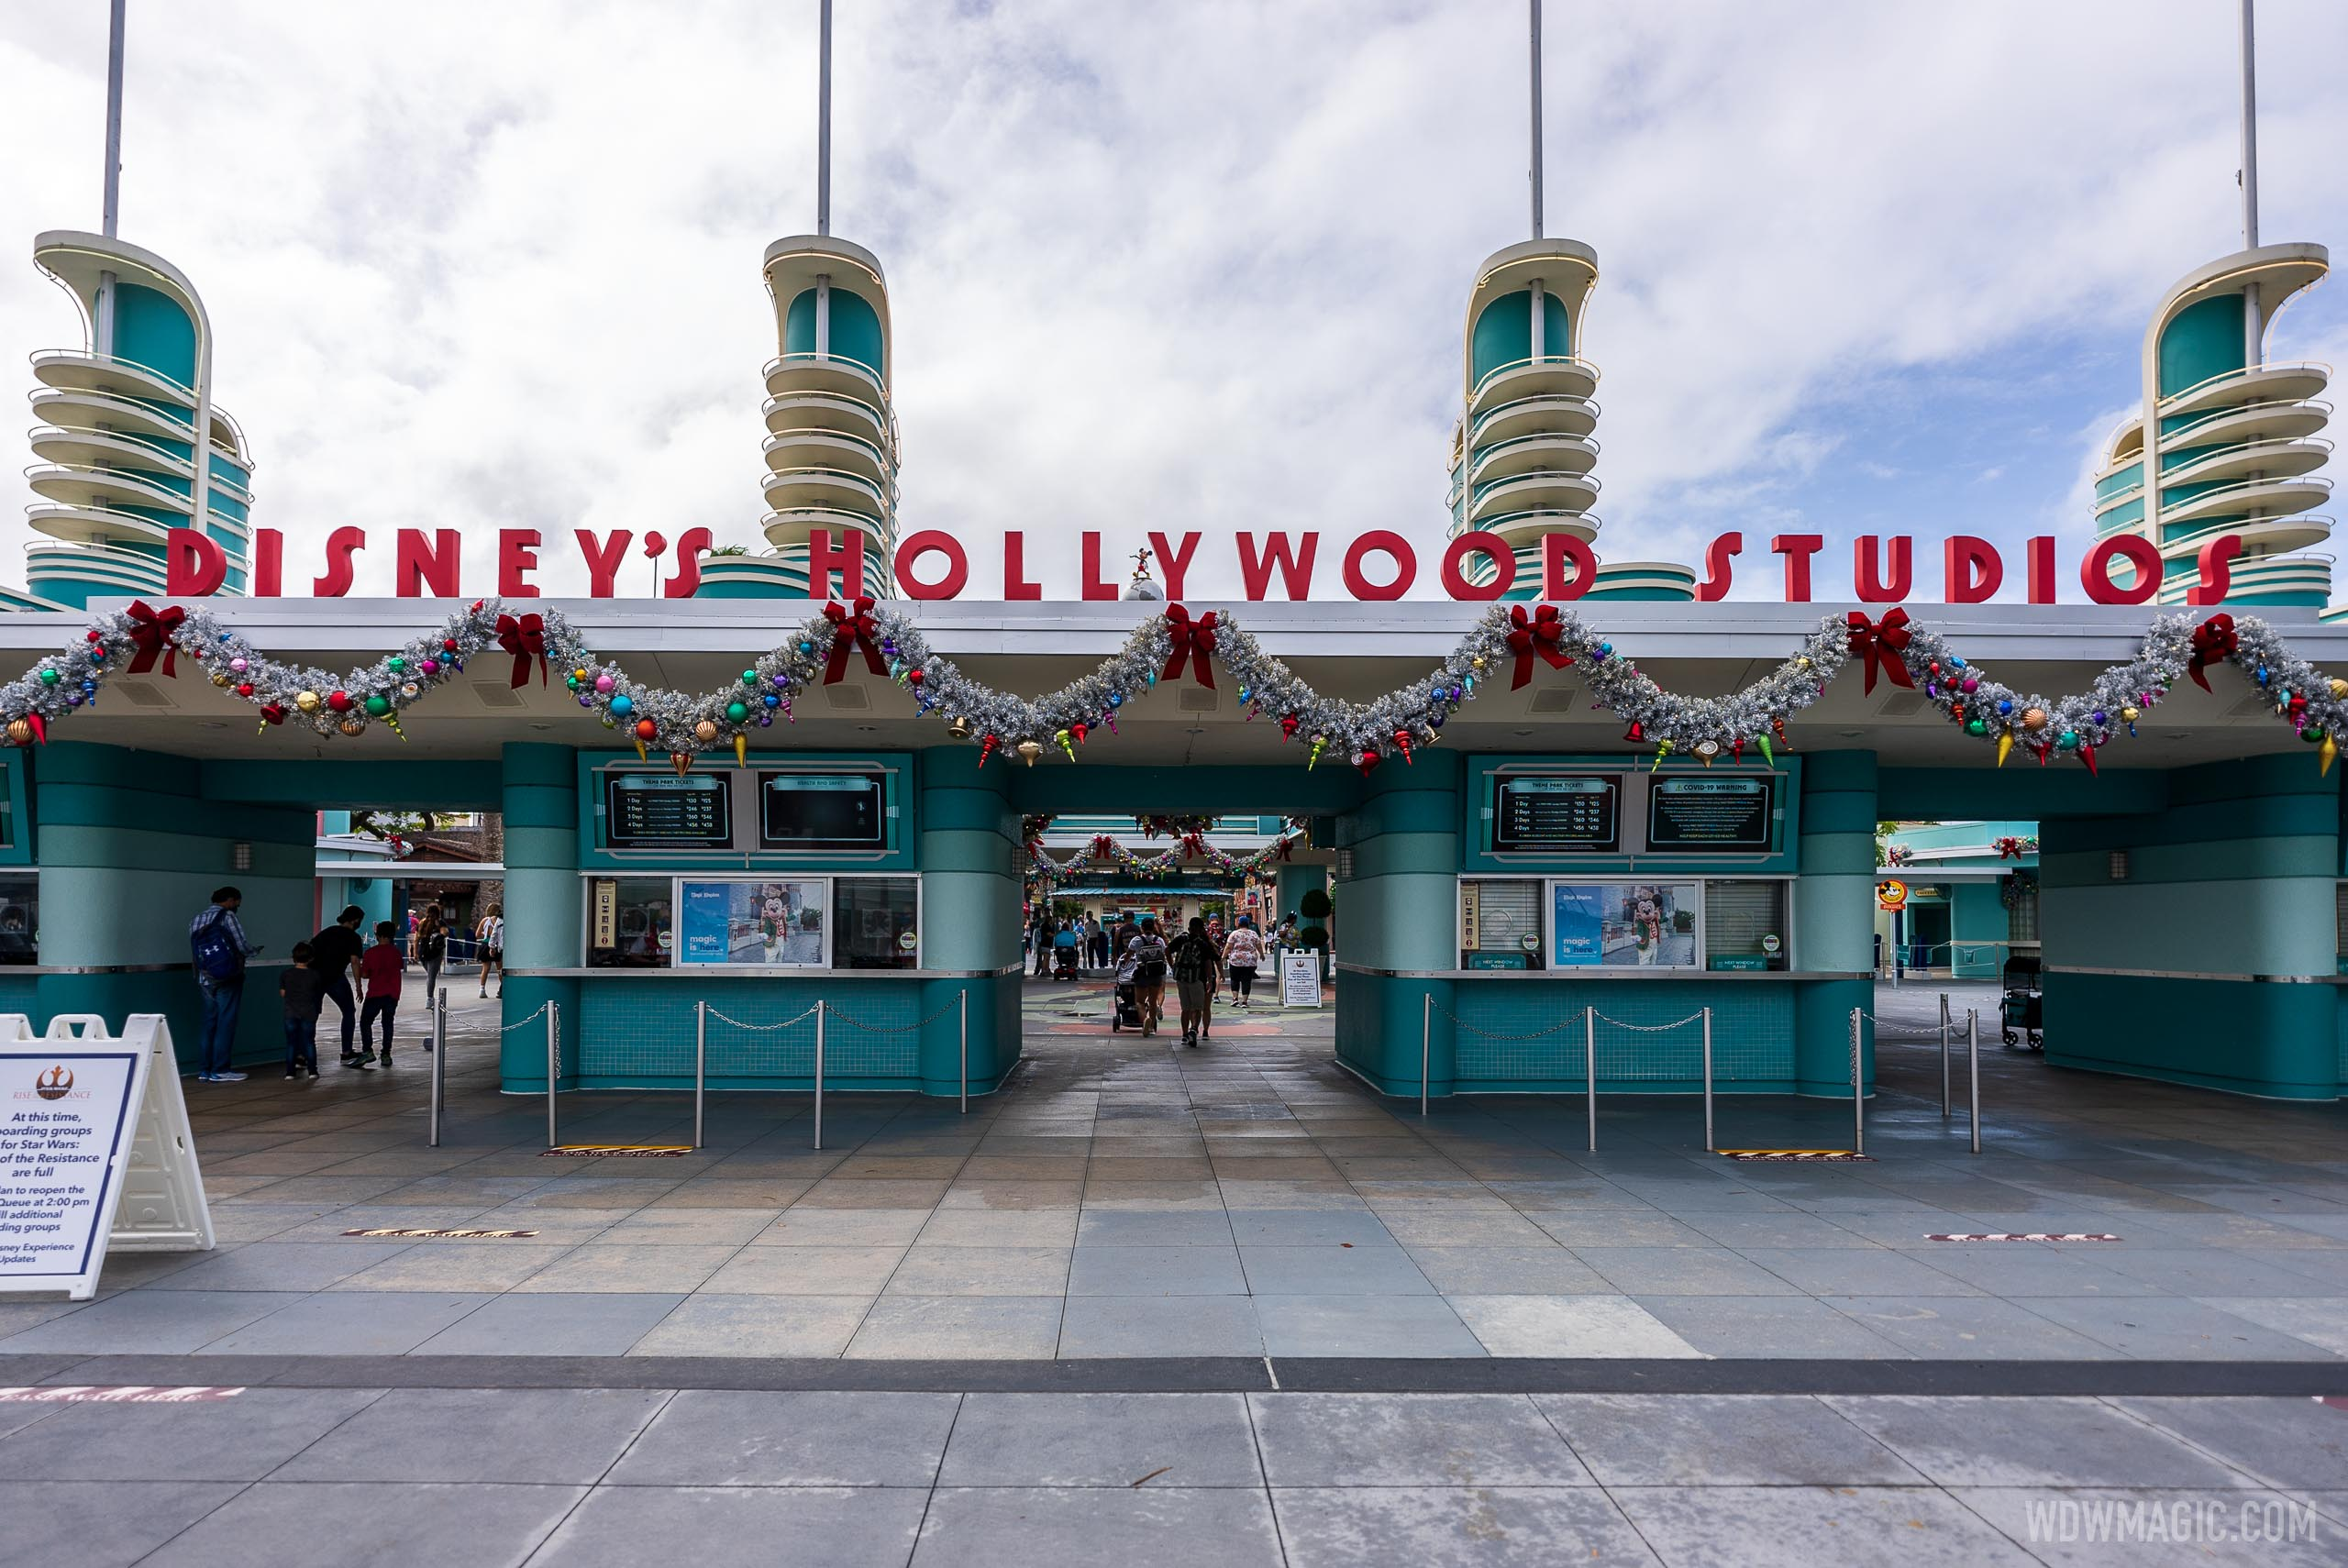 2020 Holiday Decorations at Disney's Hollywood Studios